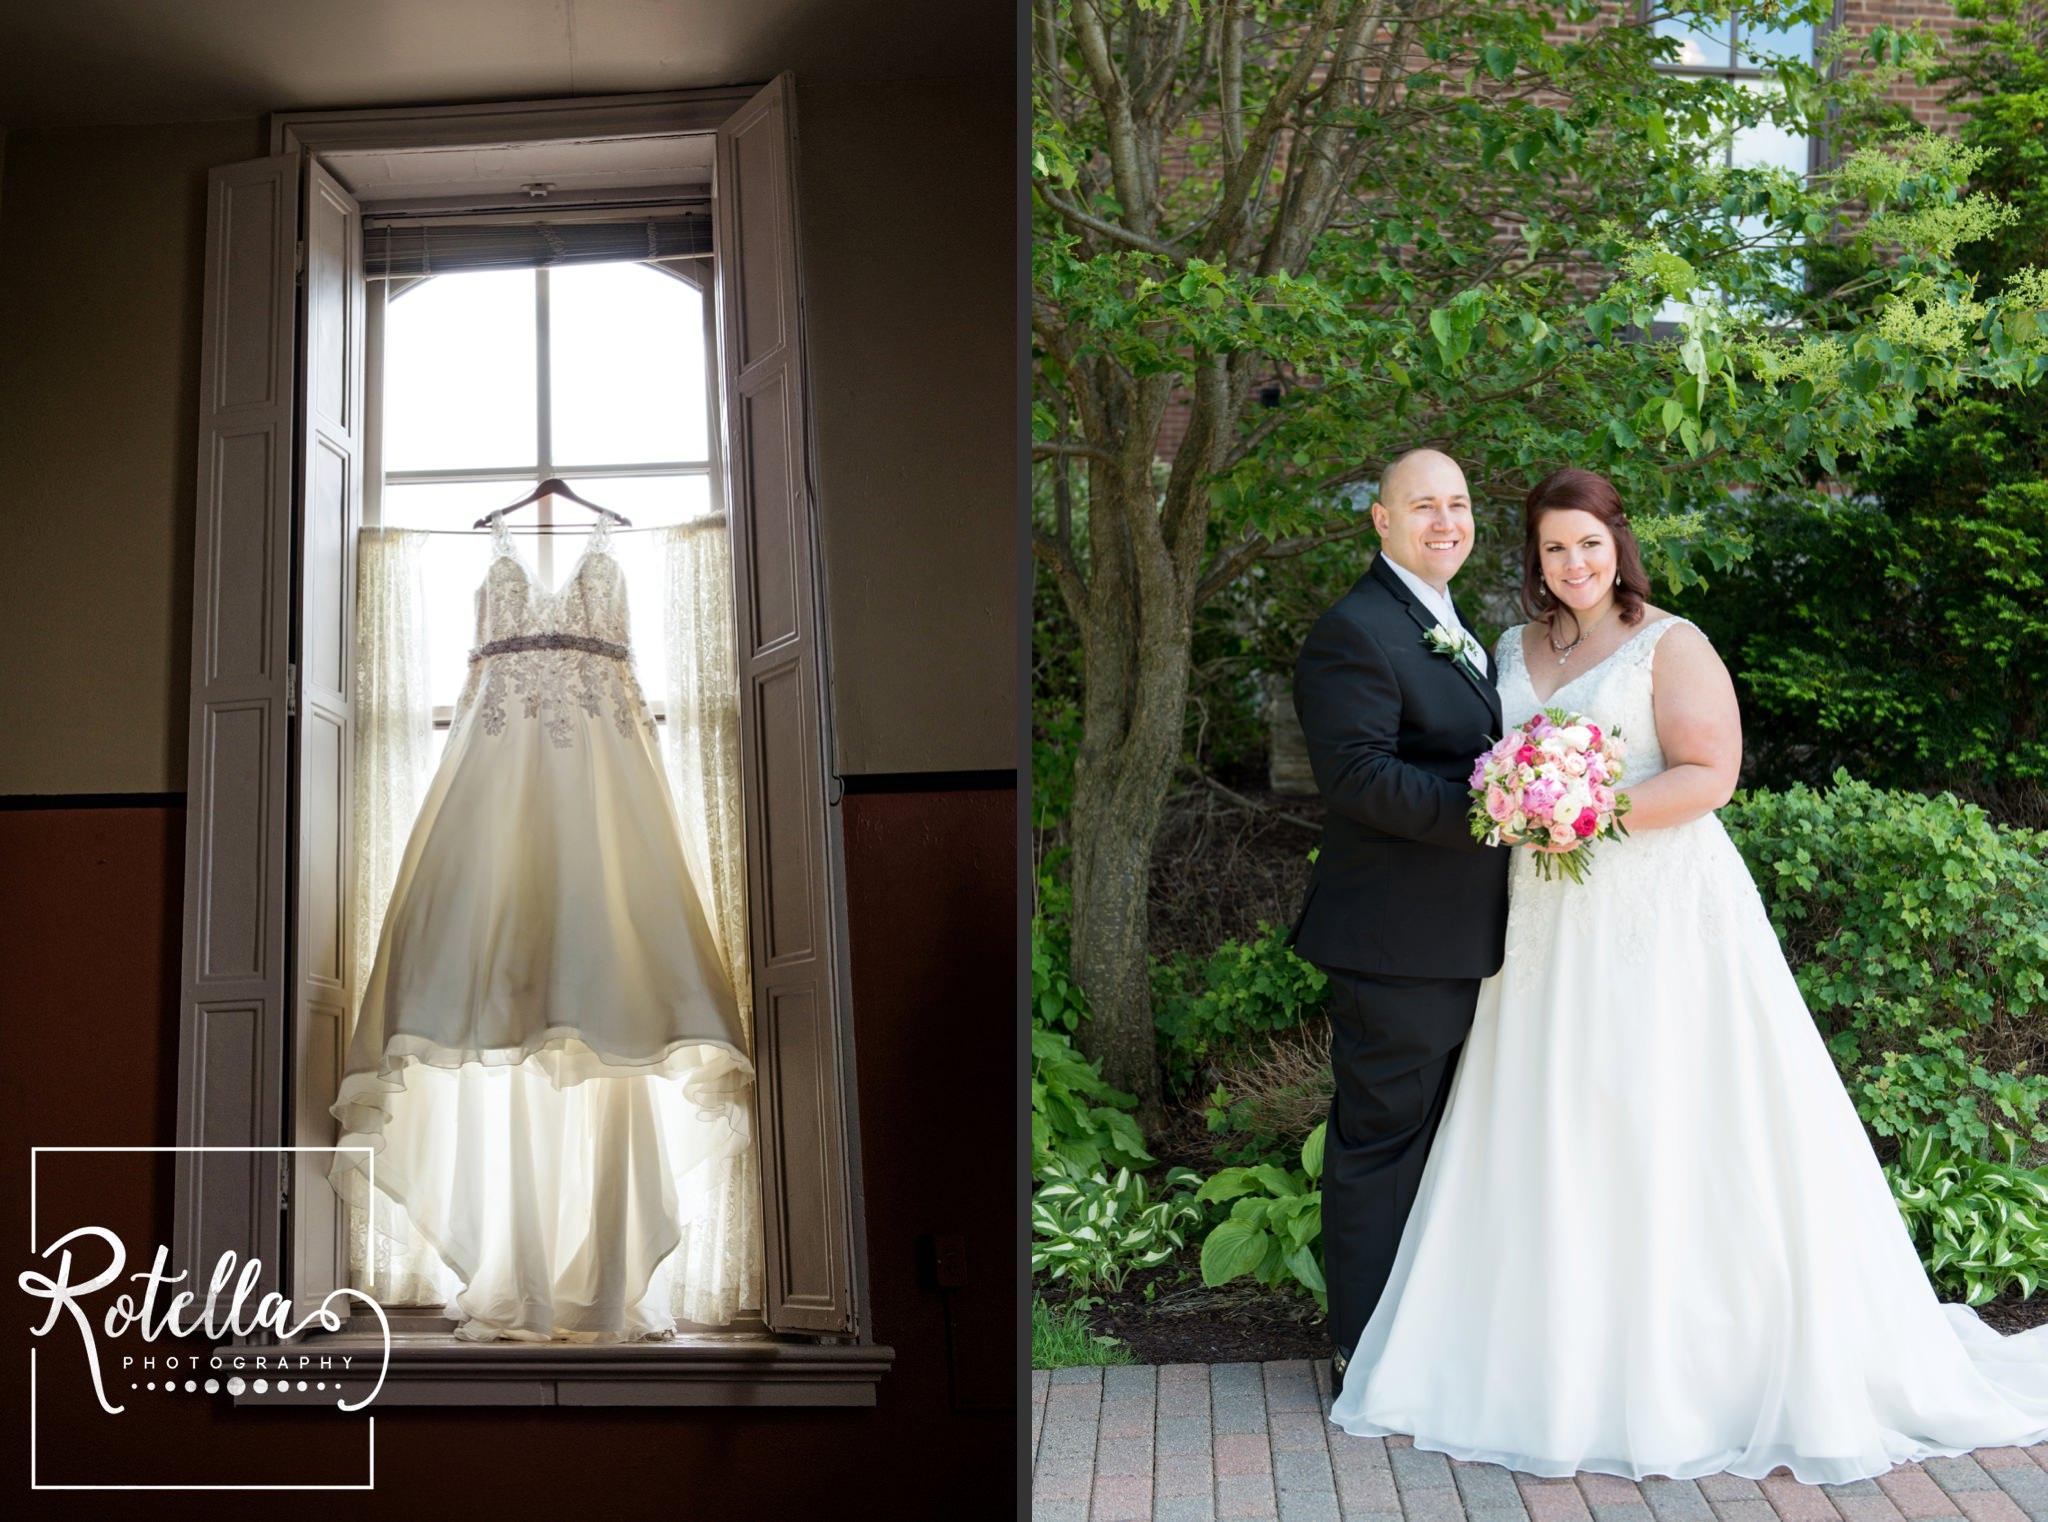 Wedding dress in window, bride and groom by trees